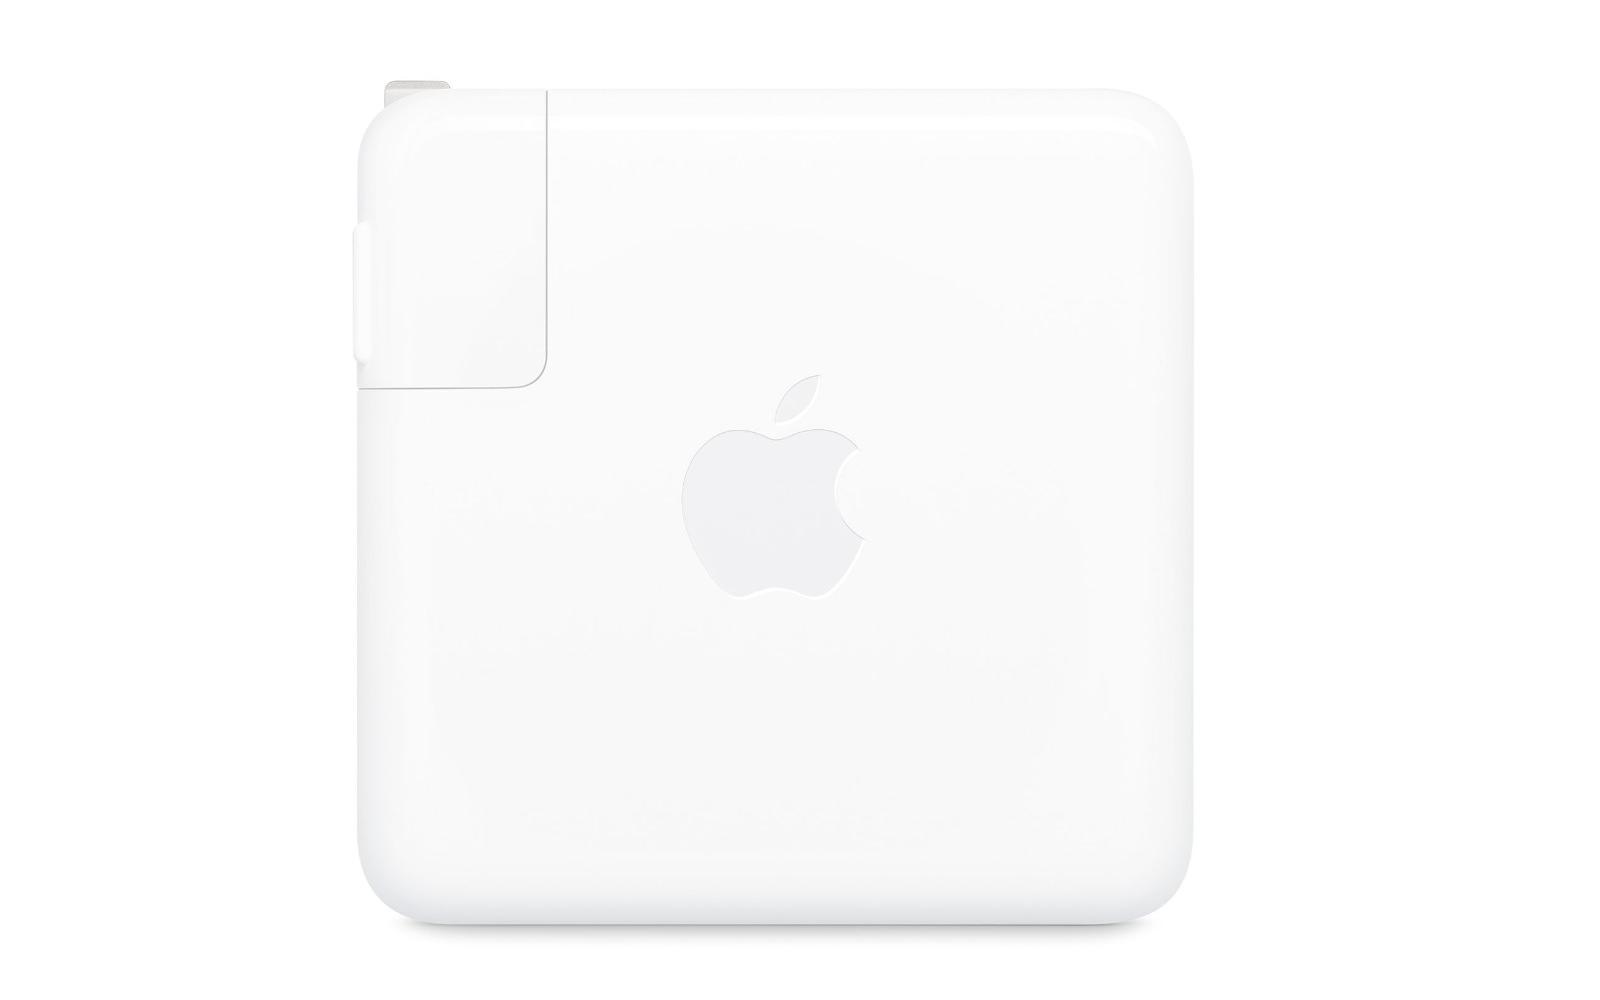 96W-Apple-USBC-Charger.jpg